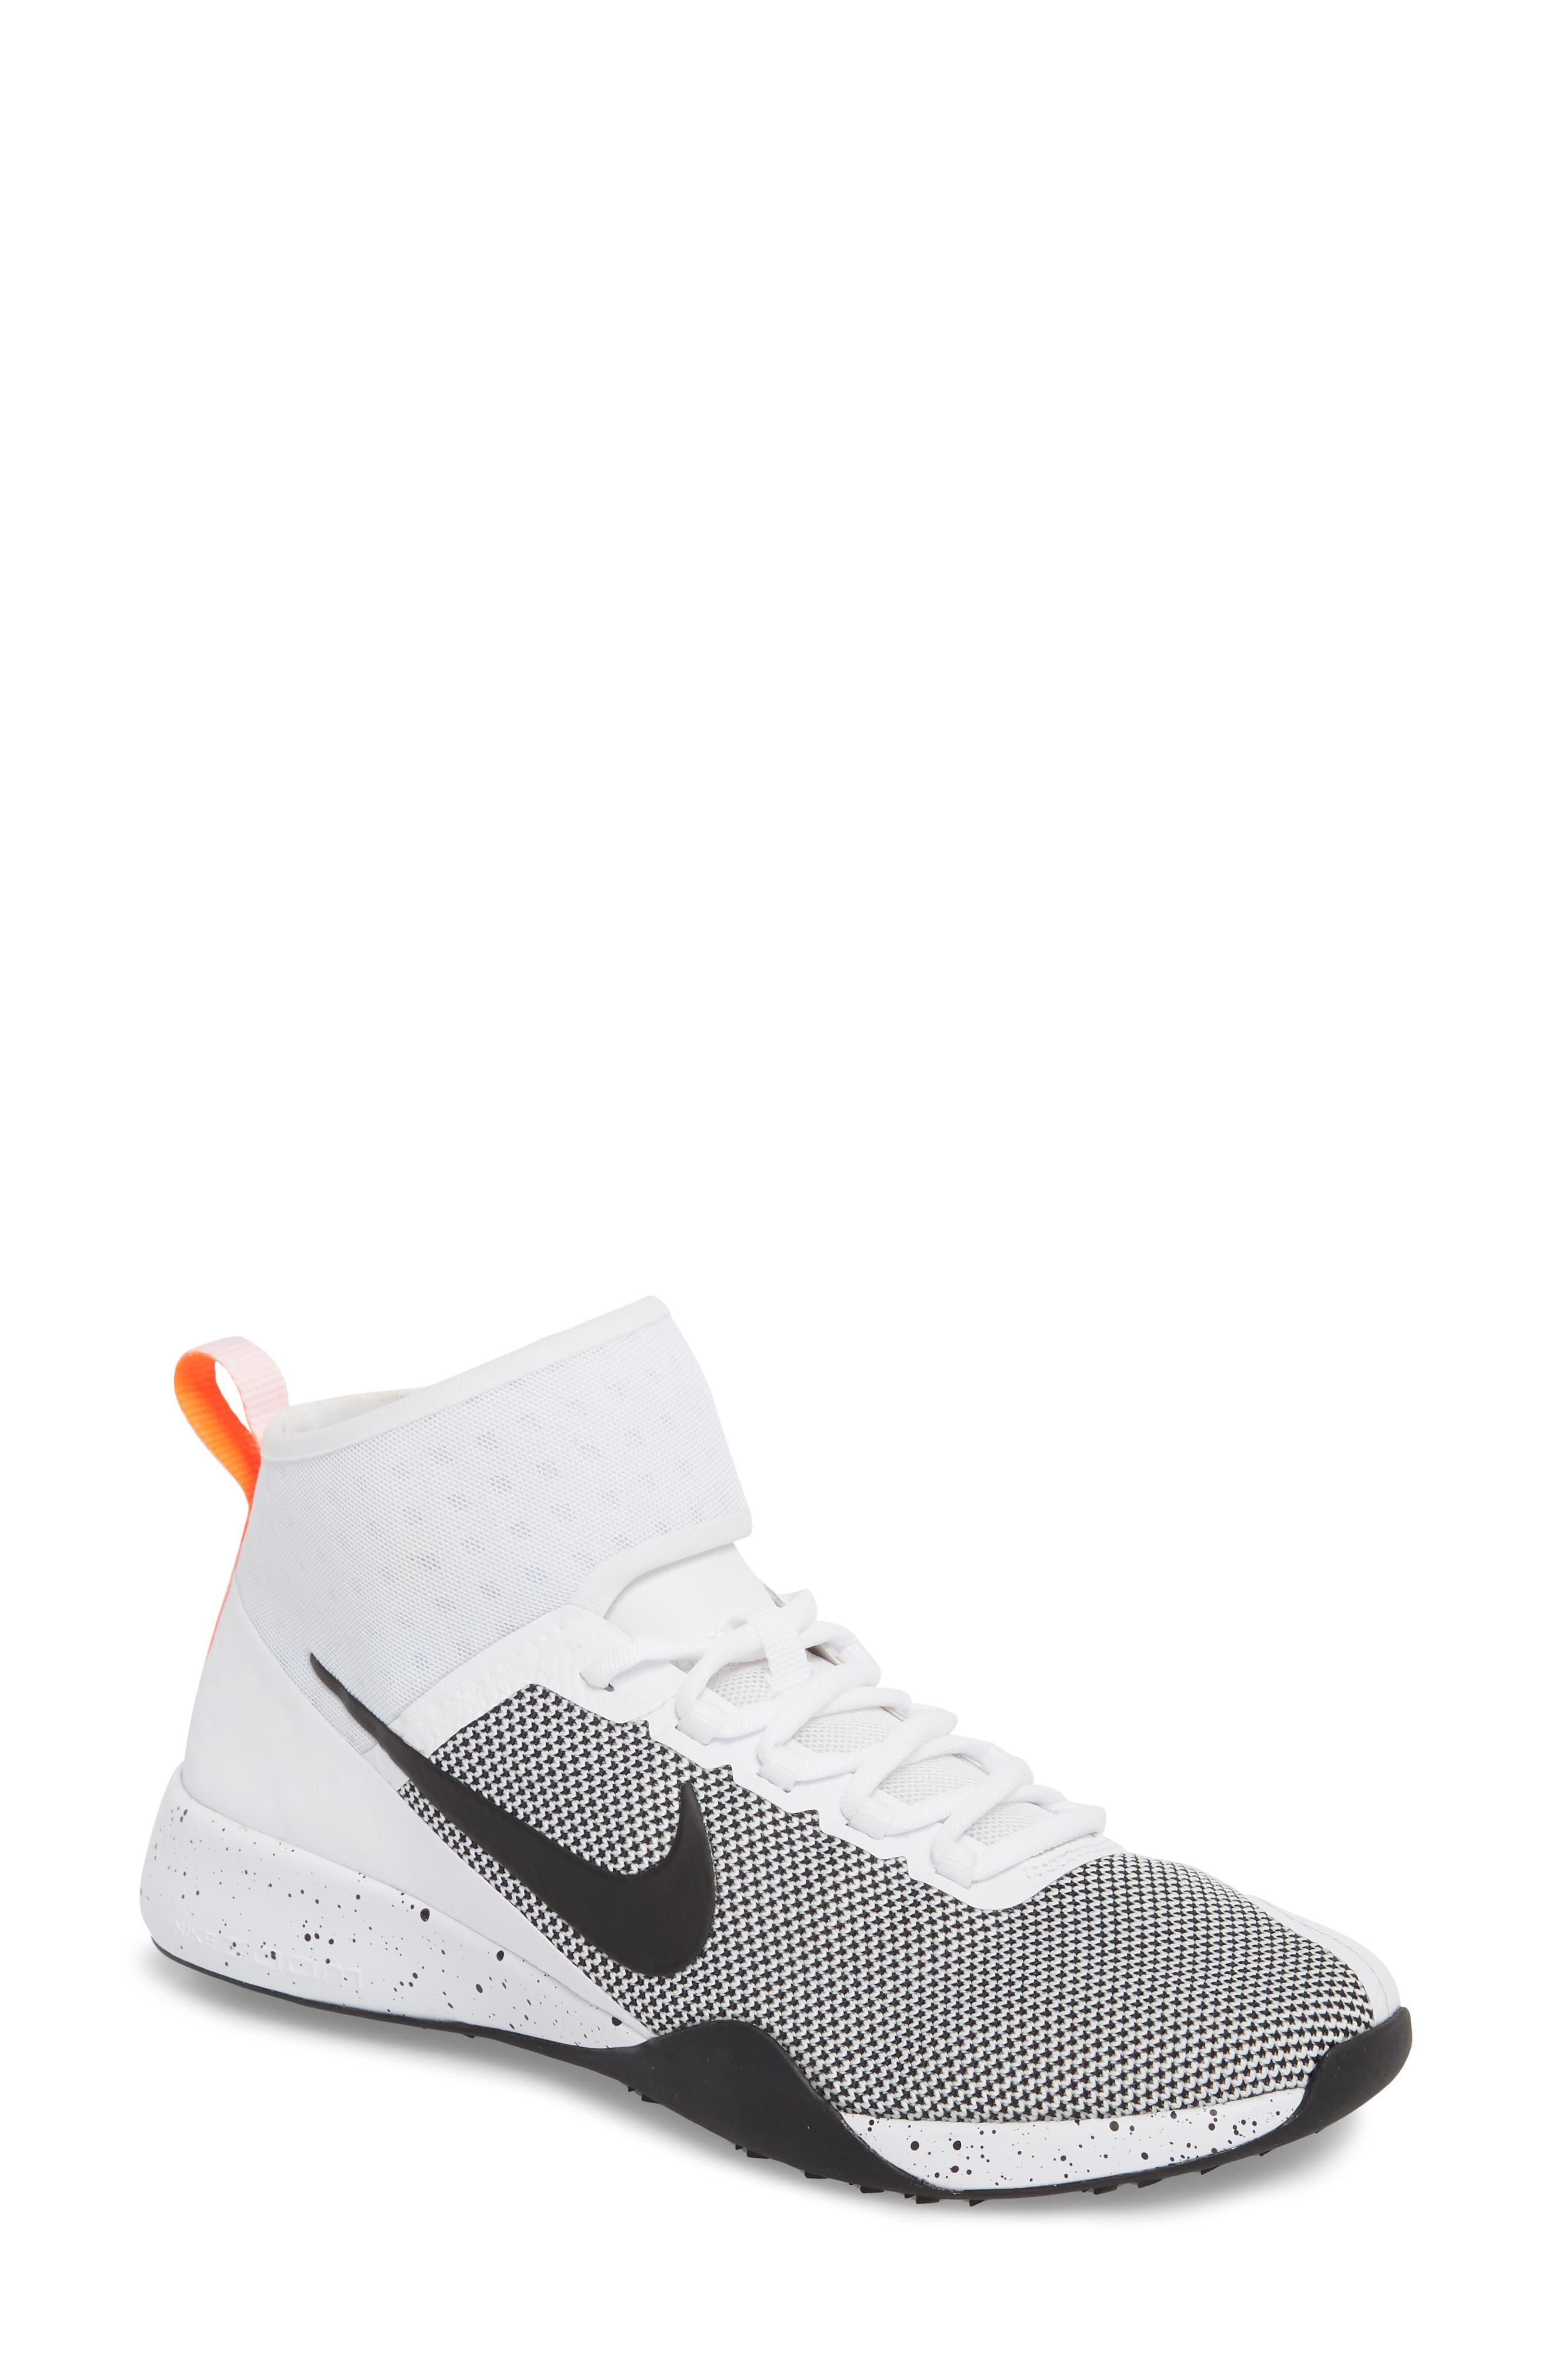 NikeLab Air Zoom Strong 2 Training Shoe,                             Main thumbnail 2, color,